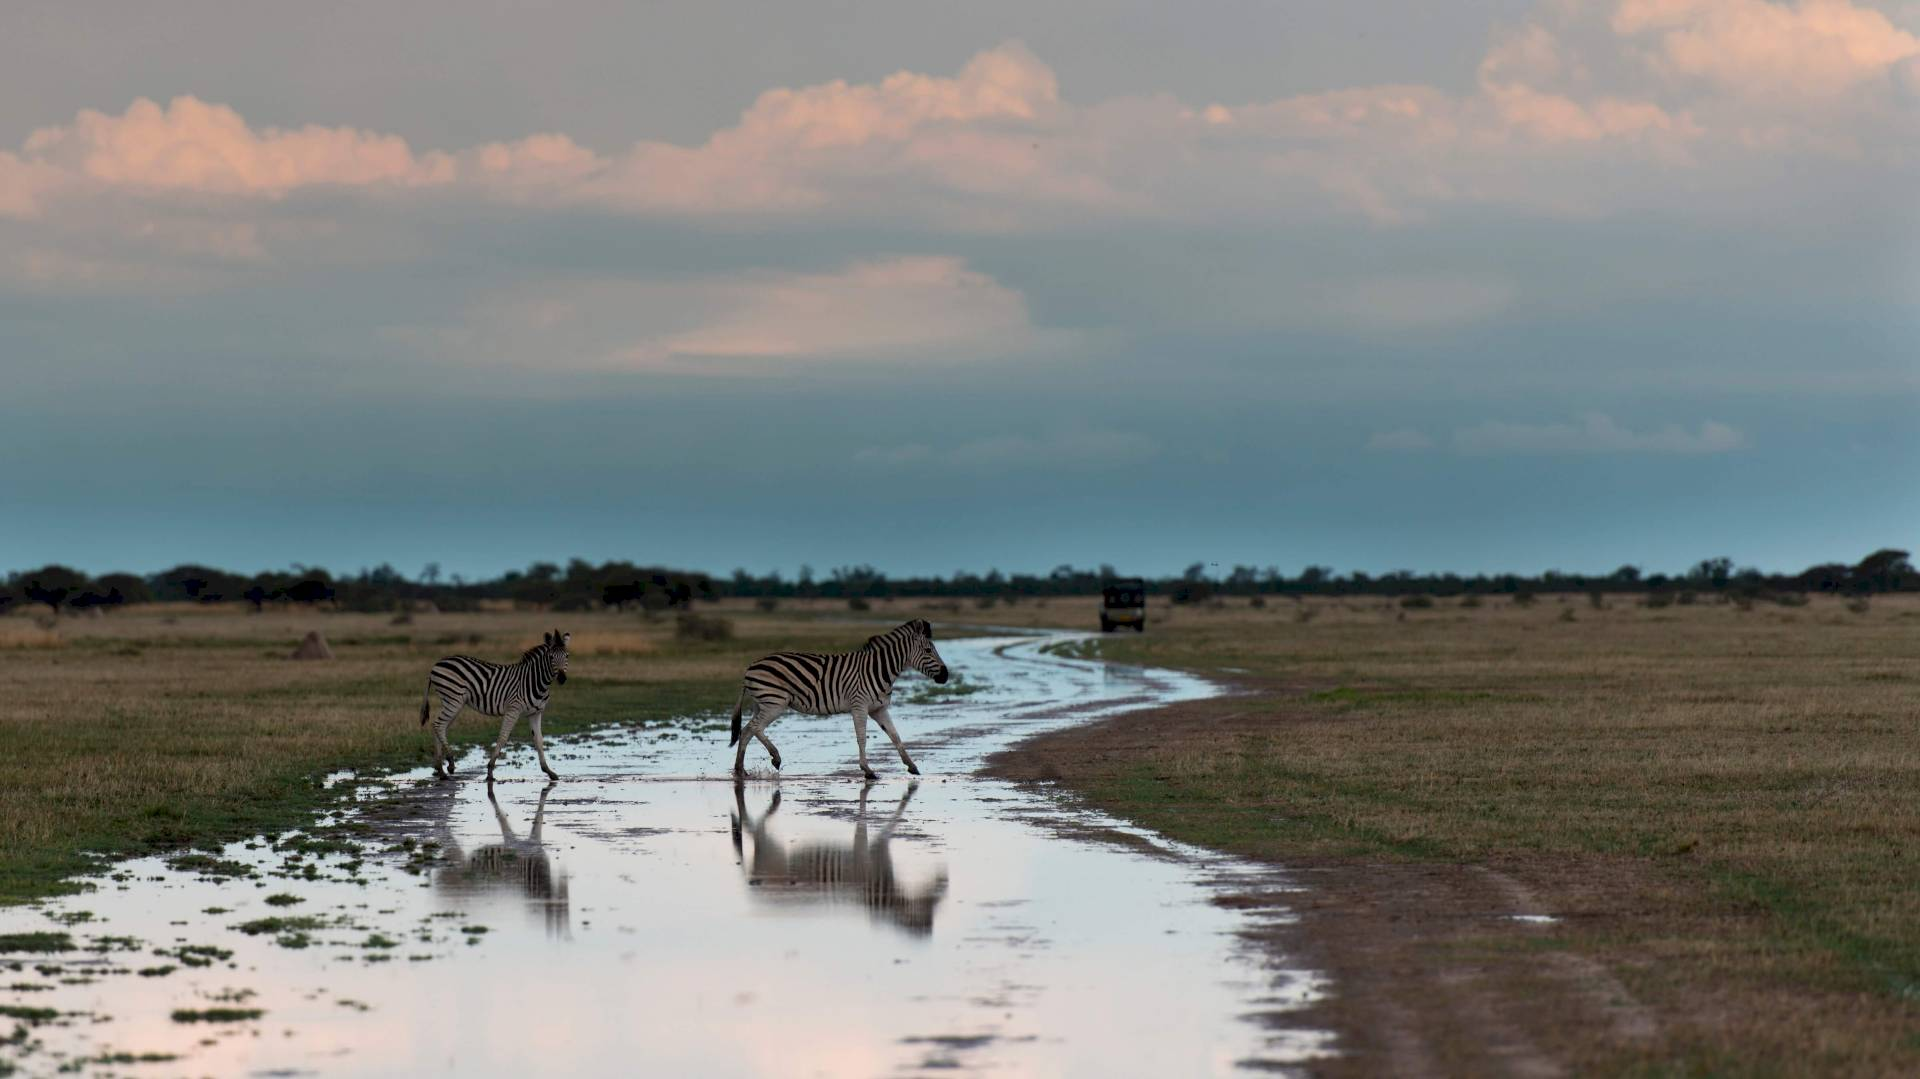 Nxai-Nationalpark